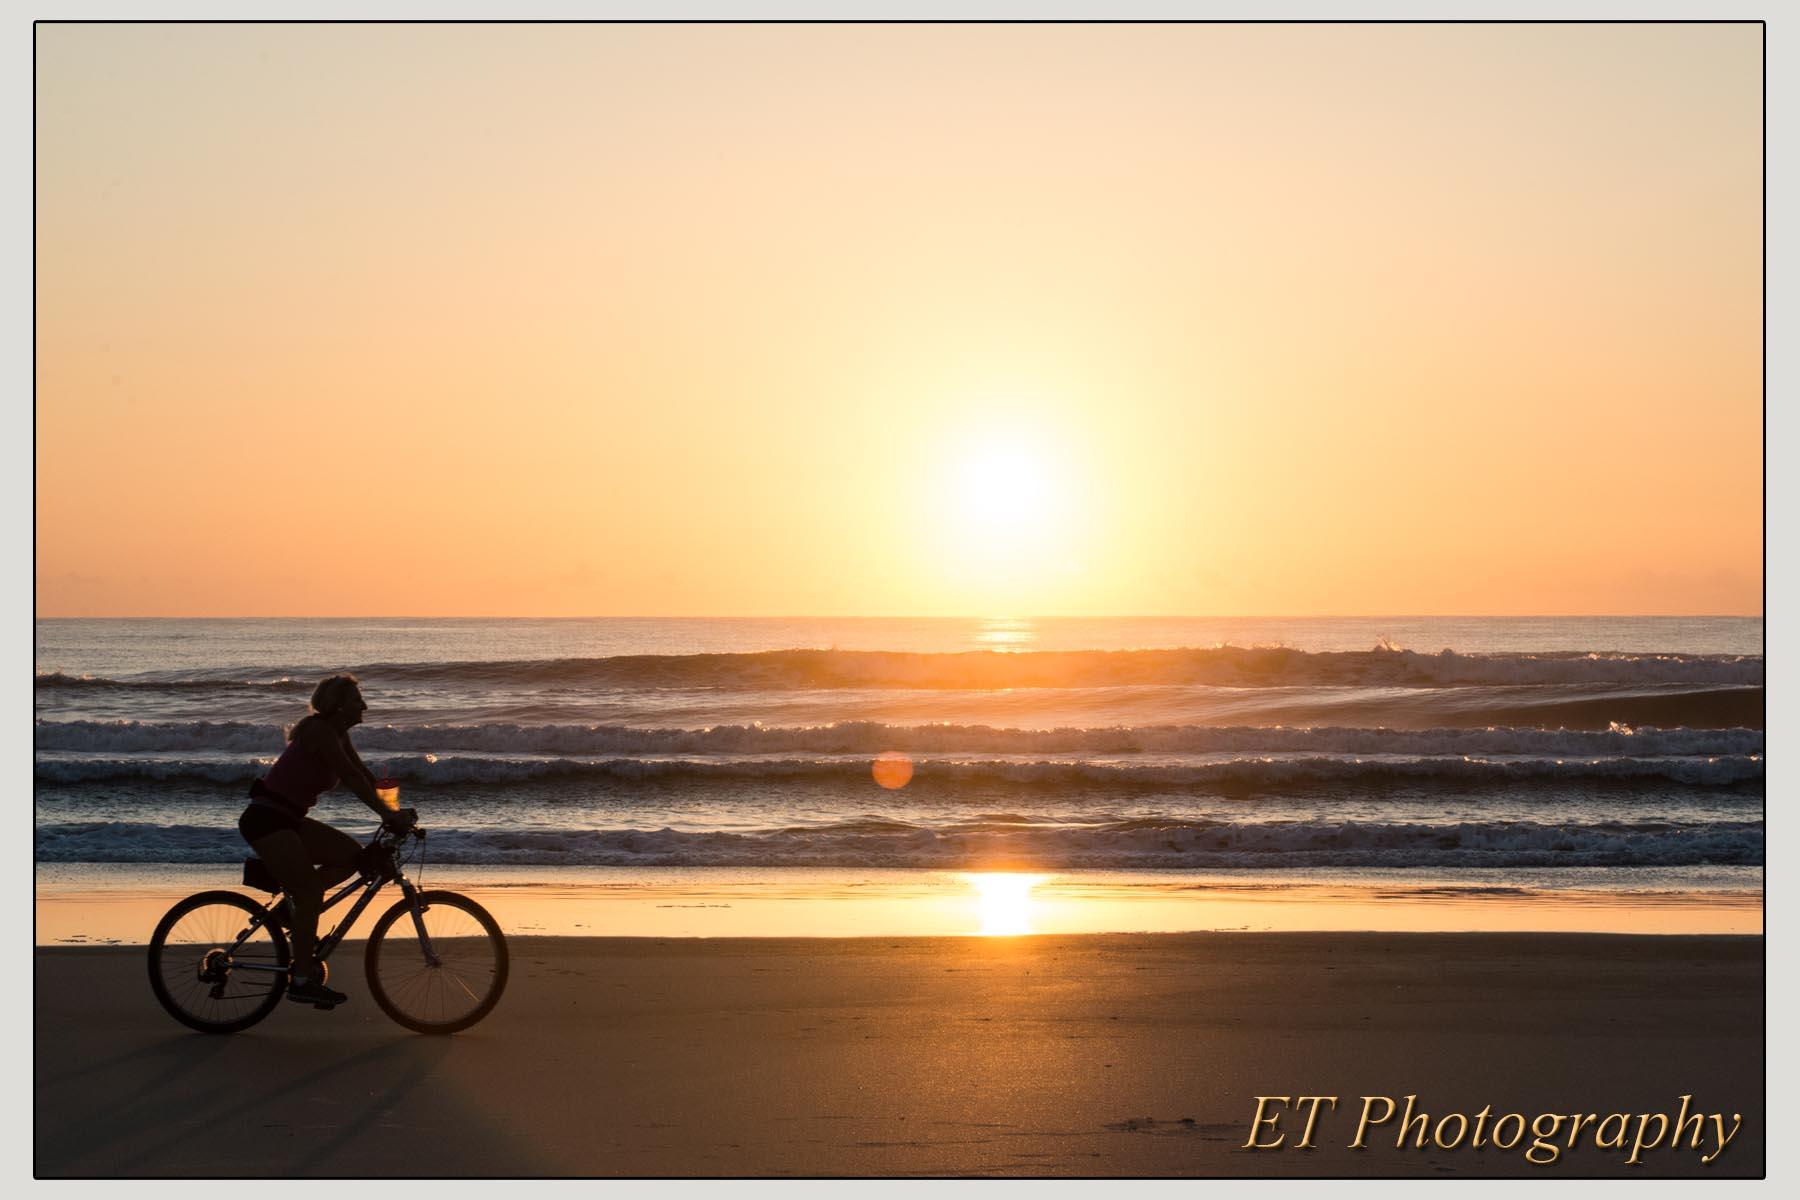 Sunrise bike rider